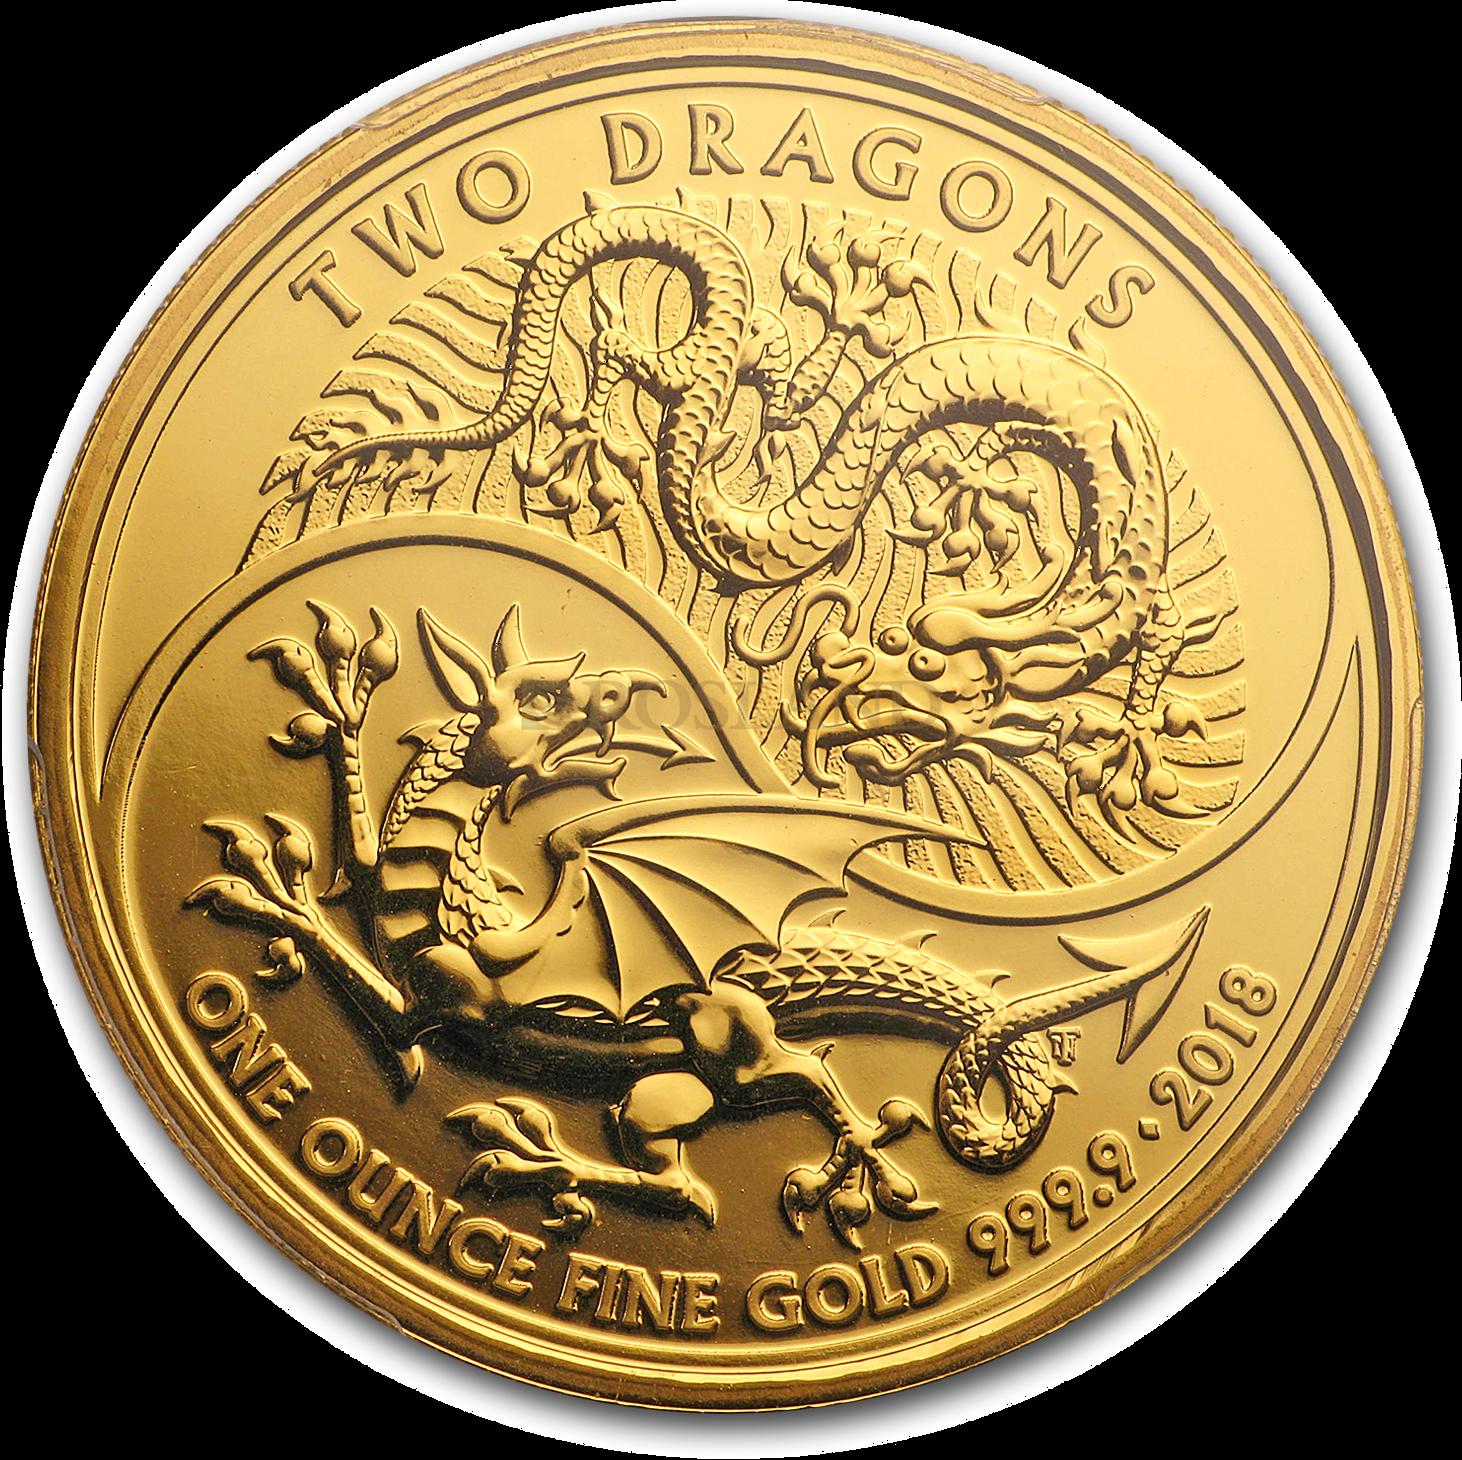 1 Unze Goldmünze Great Britain Two Dragons 2018